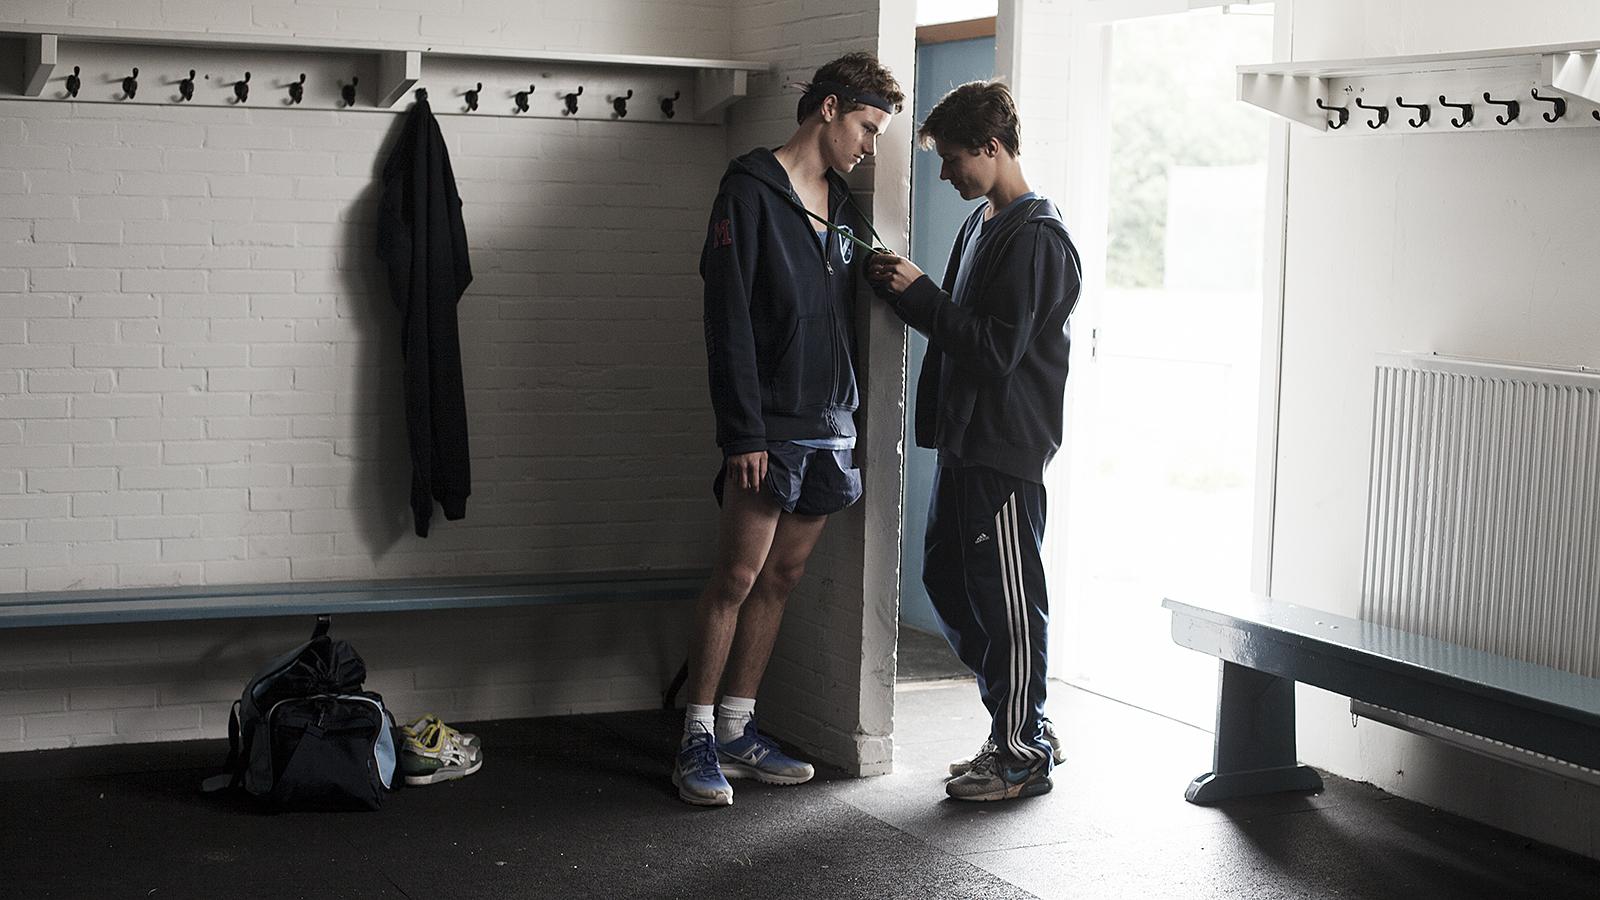 Jongens | El fotograma | Cine gay